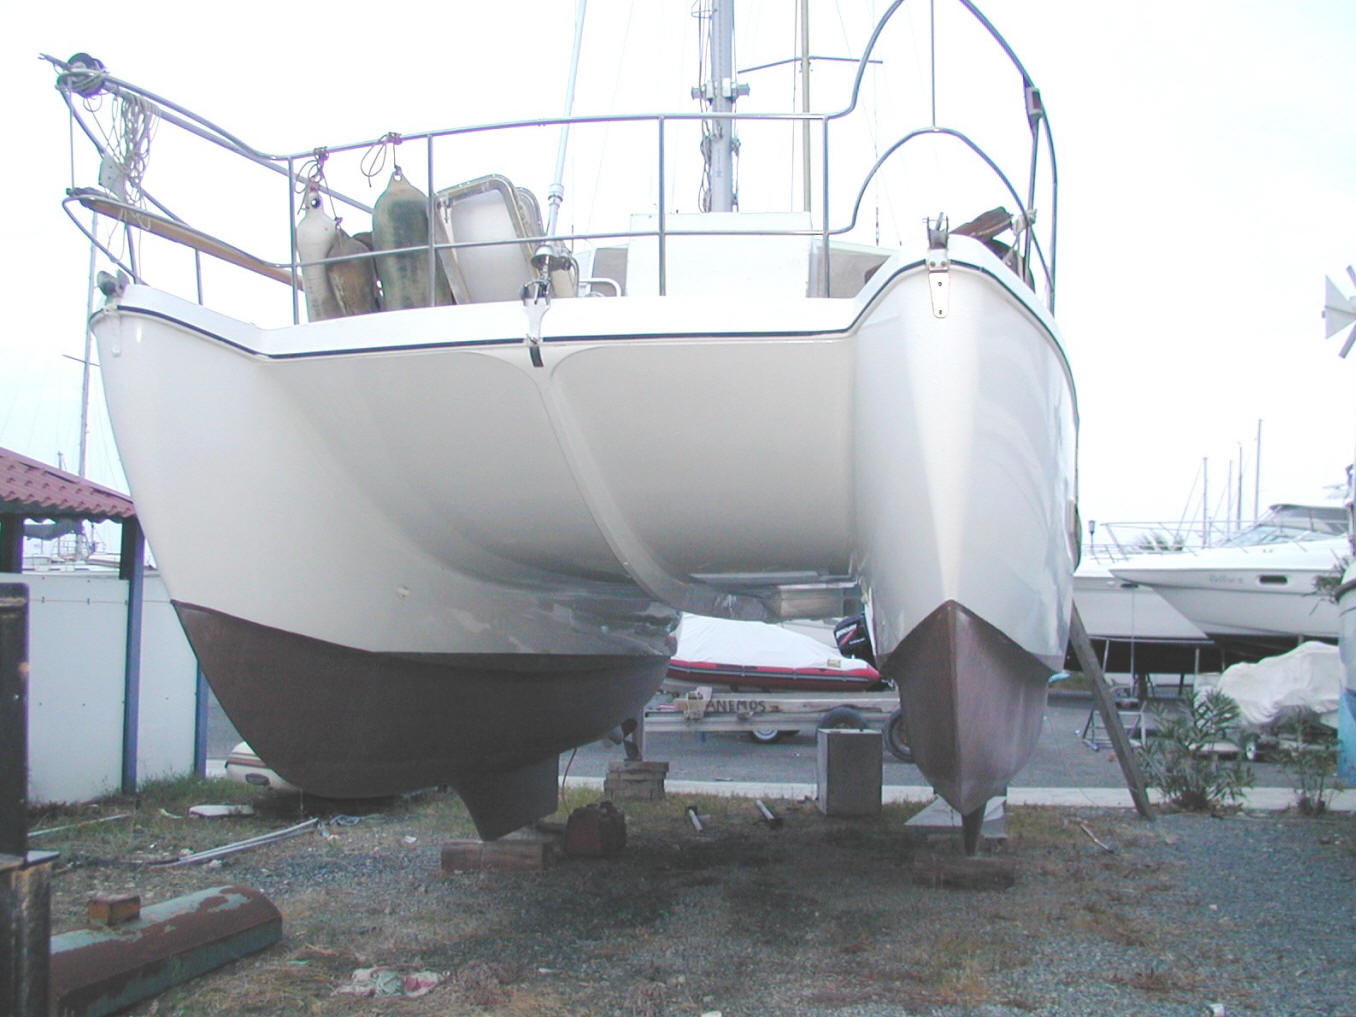 Makeamodelboat Model Boat Galleries Models Selway